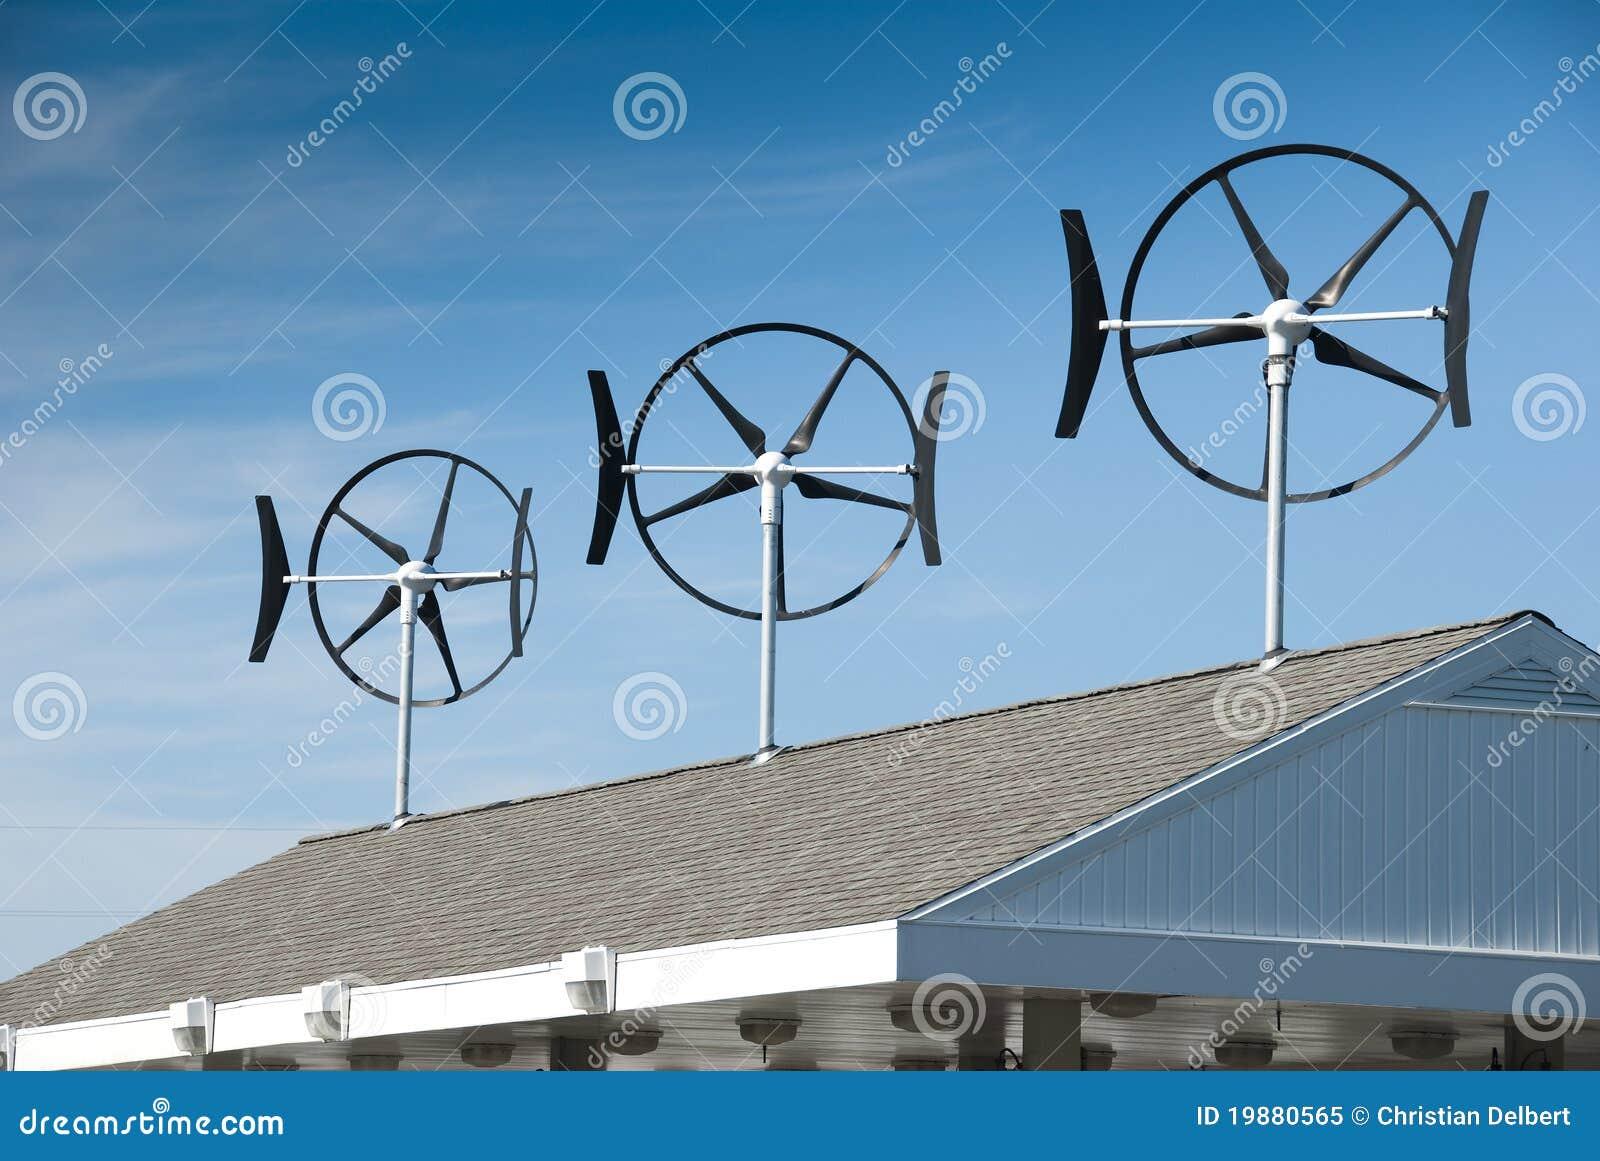 Small Wind Turbines Royalty Free Stock Photo - Image: 19880565